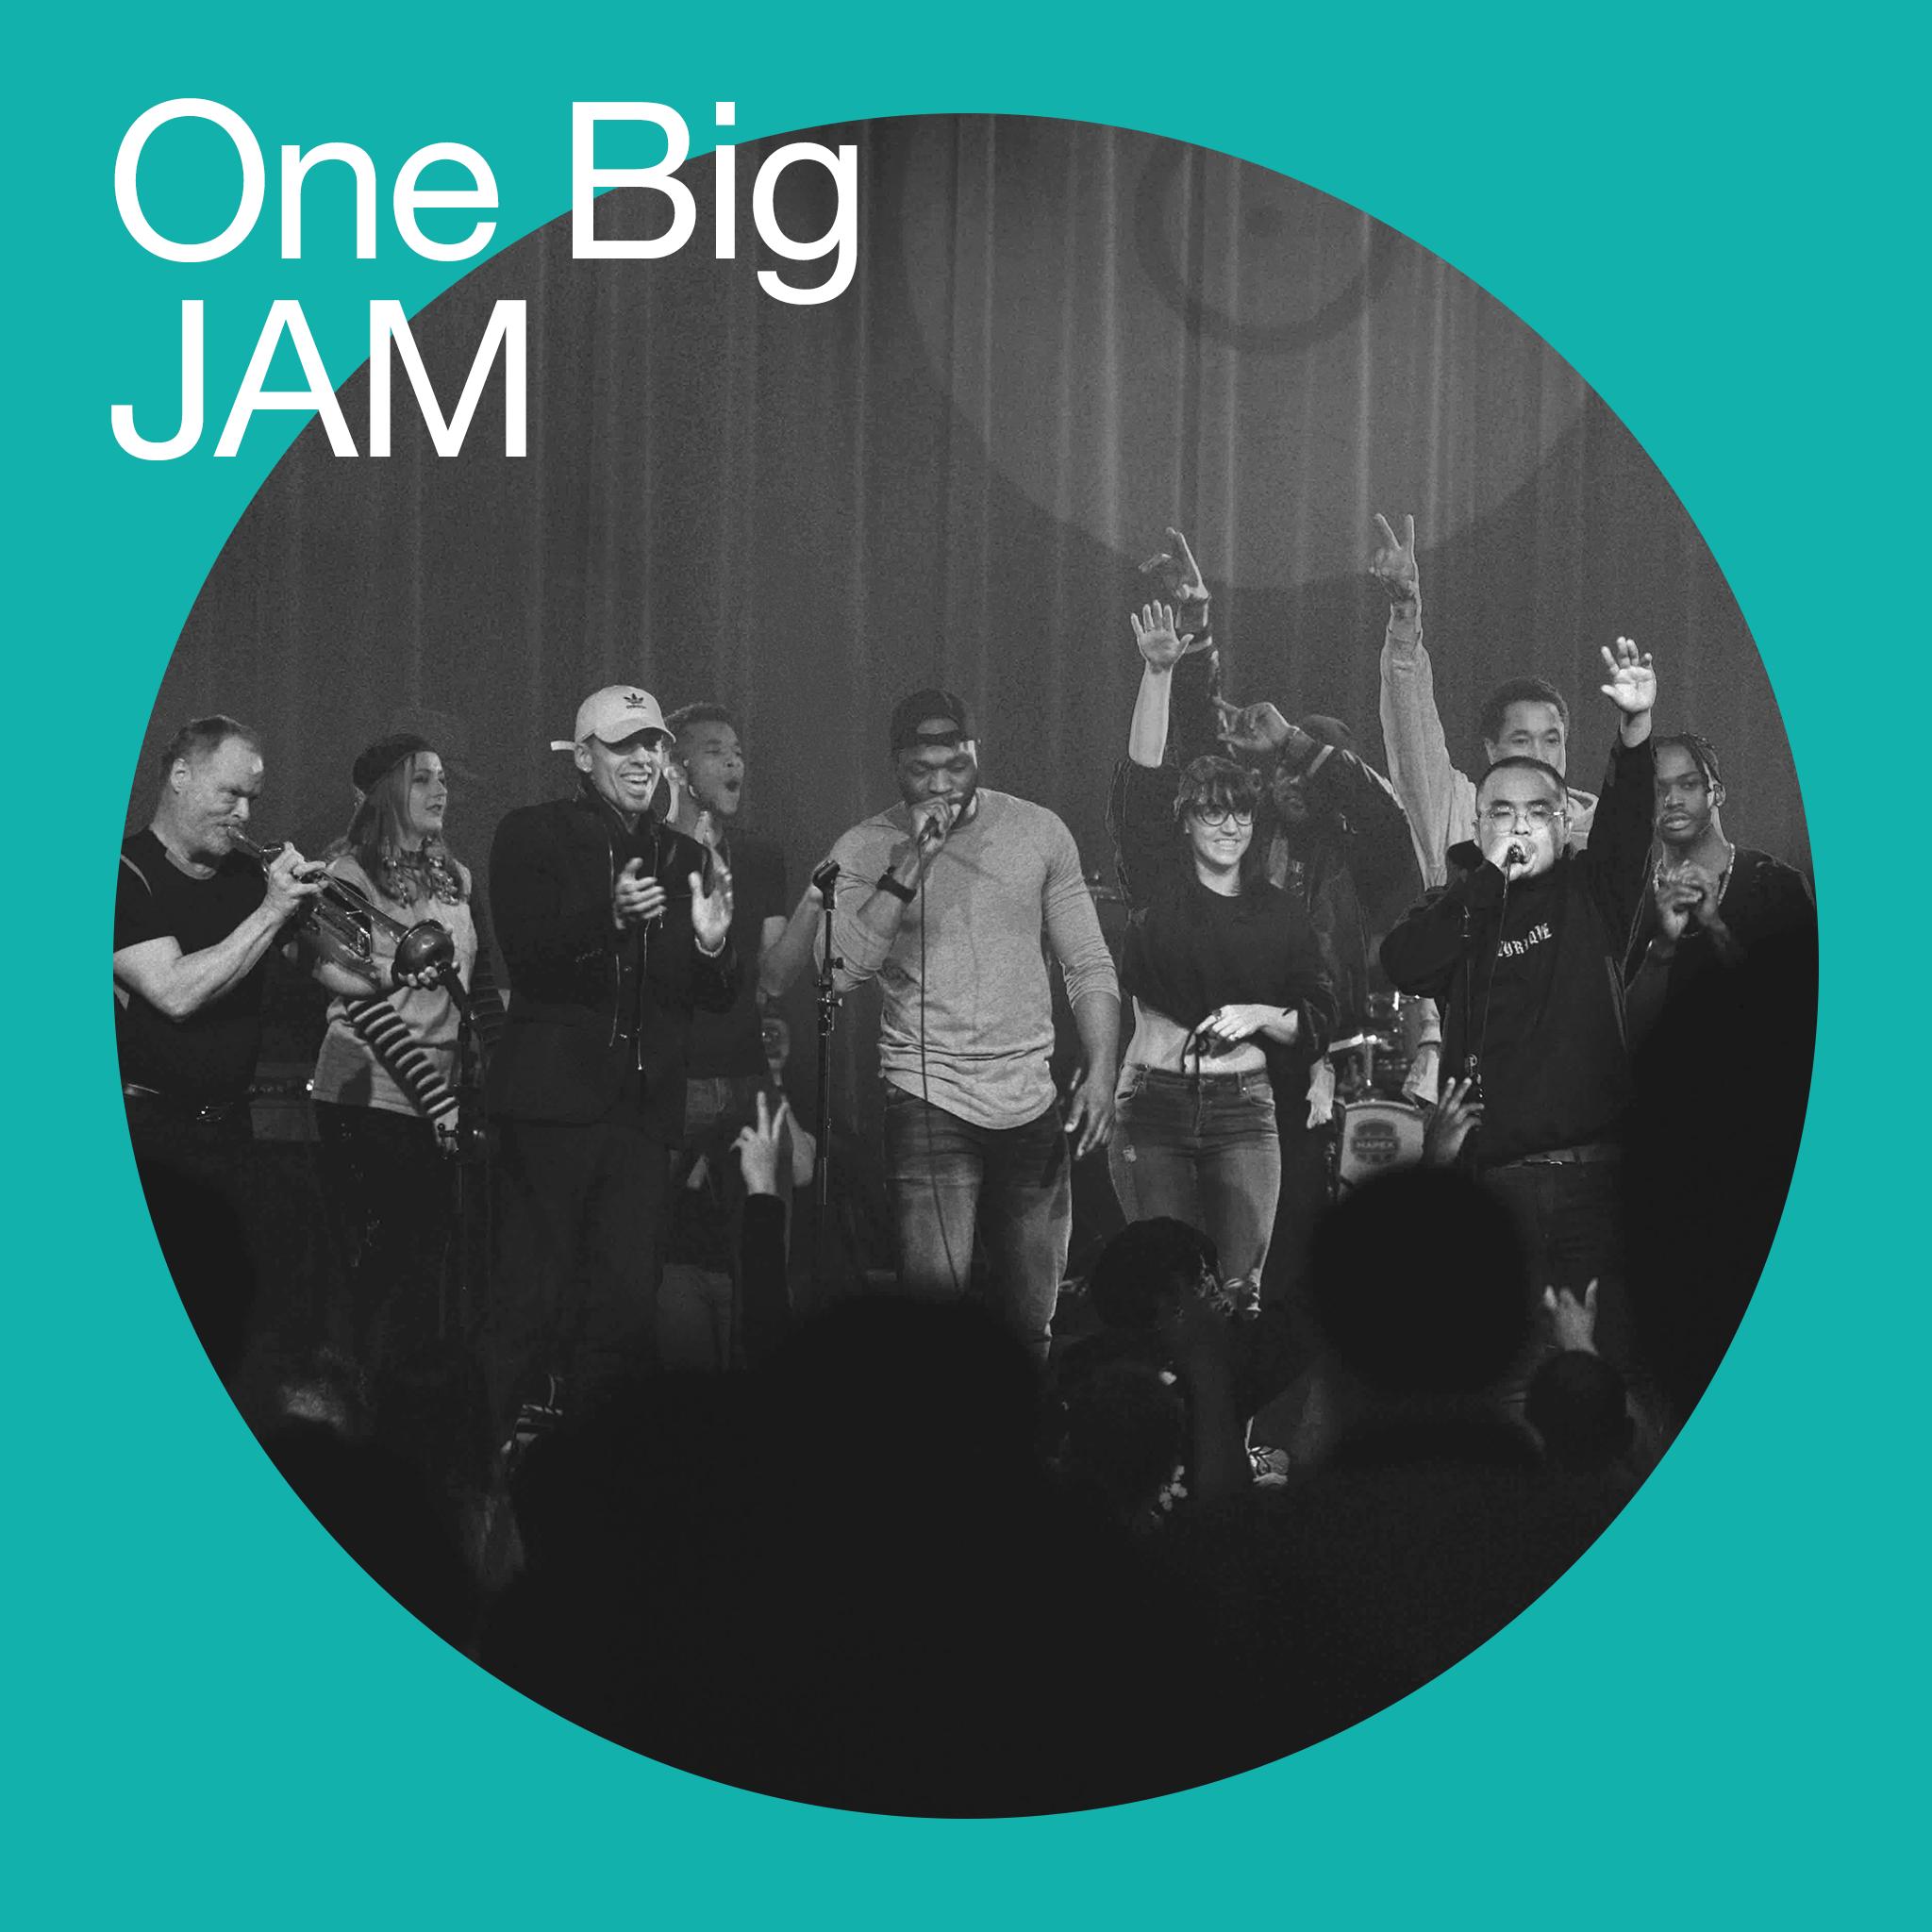 One Big JAM | A Fully Improvised Performance